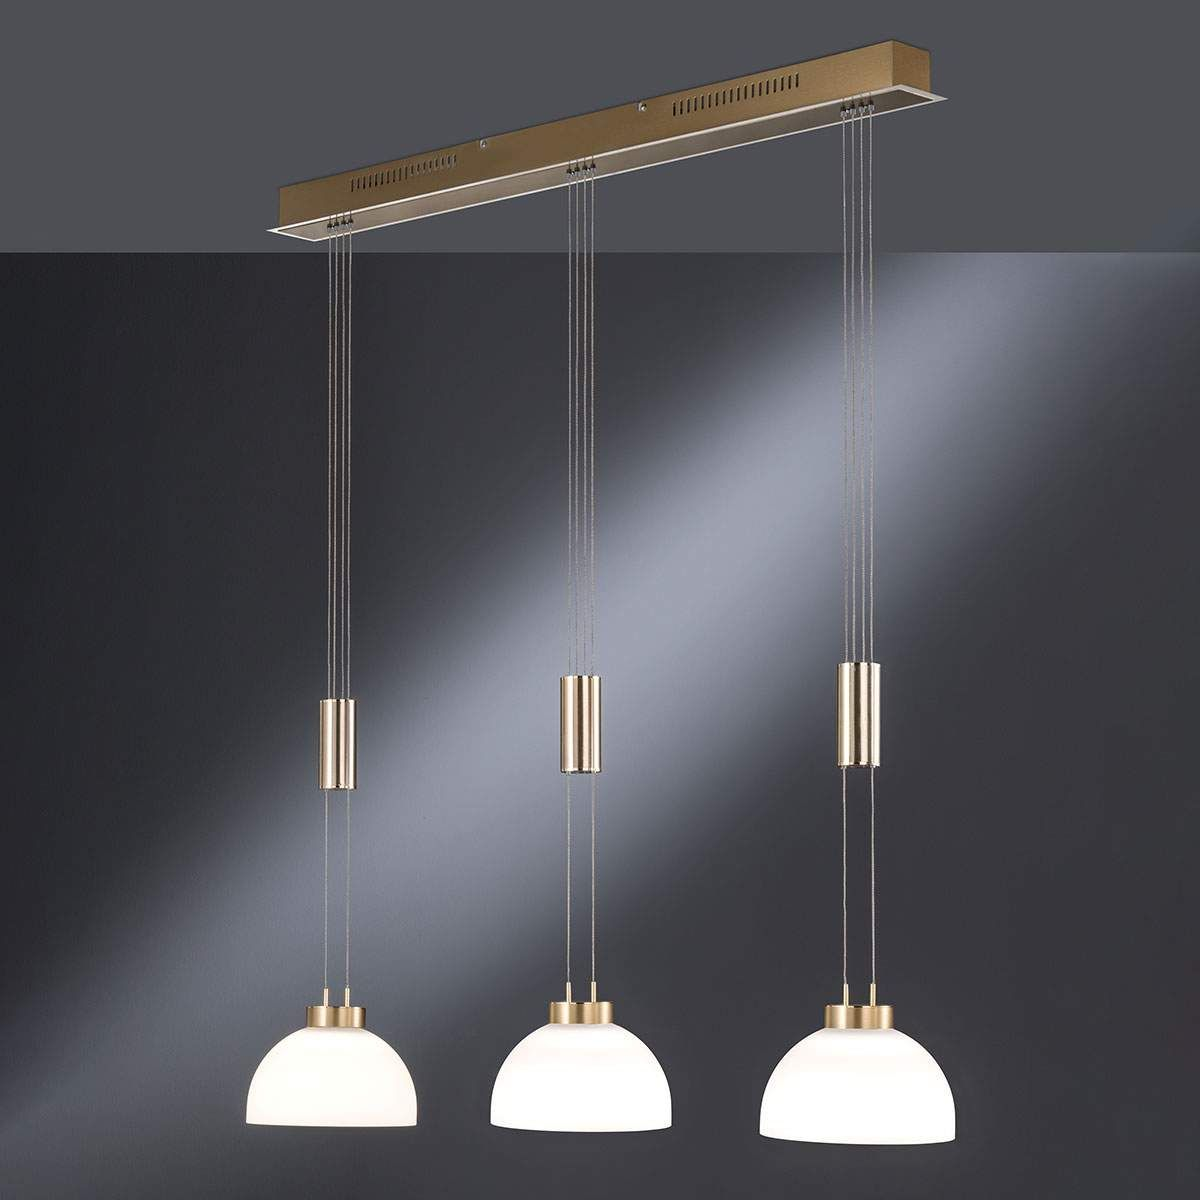 Pendellampe Shine Höhenverstellbar 3fl Jetzt Bestellen Unter Https Moebel Ladendirekt De Lampen Deckenleuchten Pendelle Pendellampen Deckenleuchten Lampen